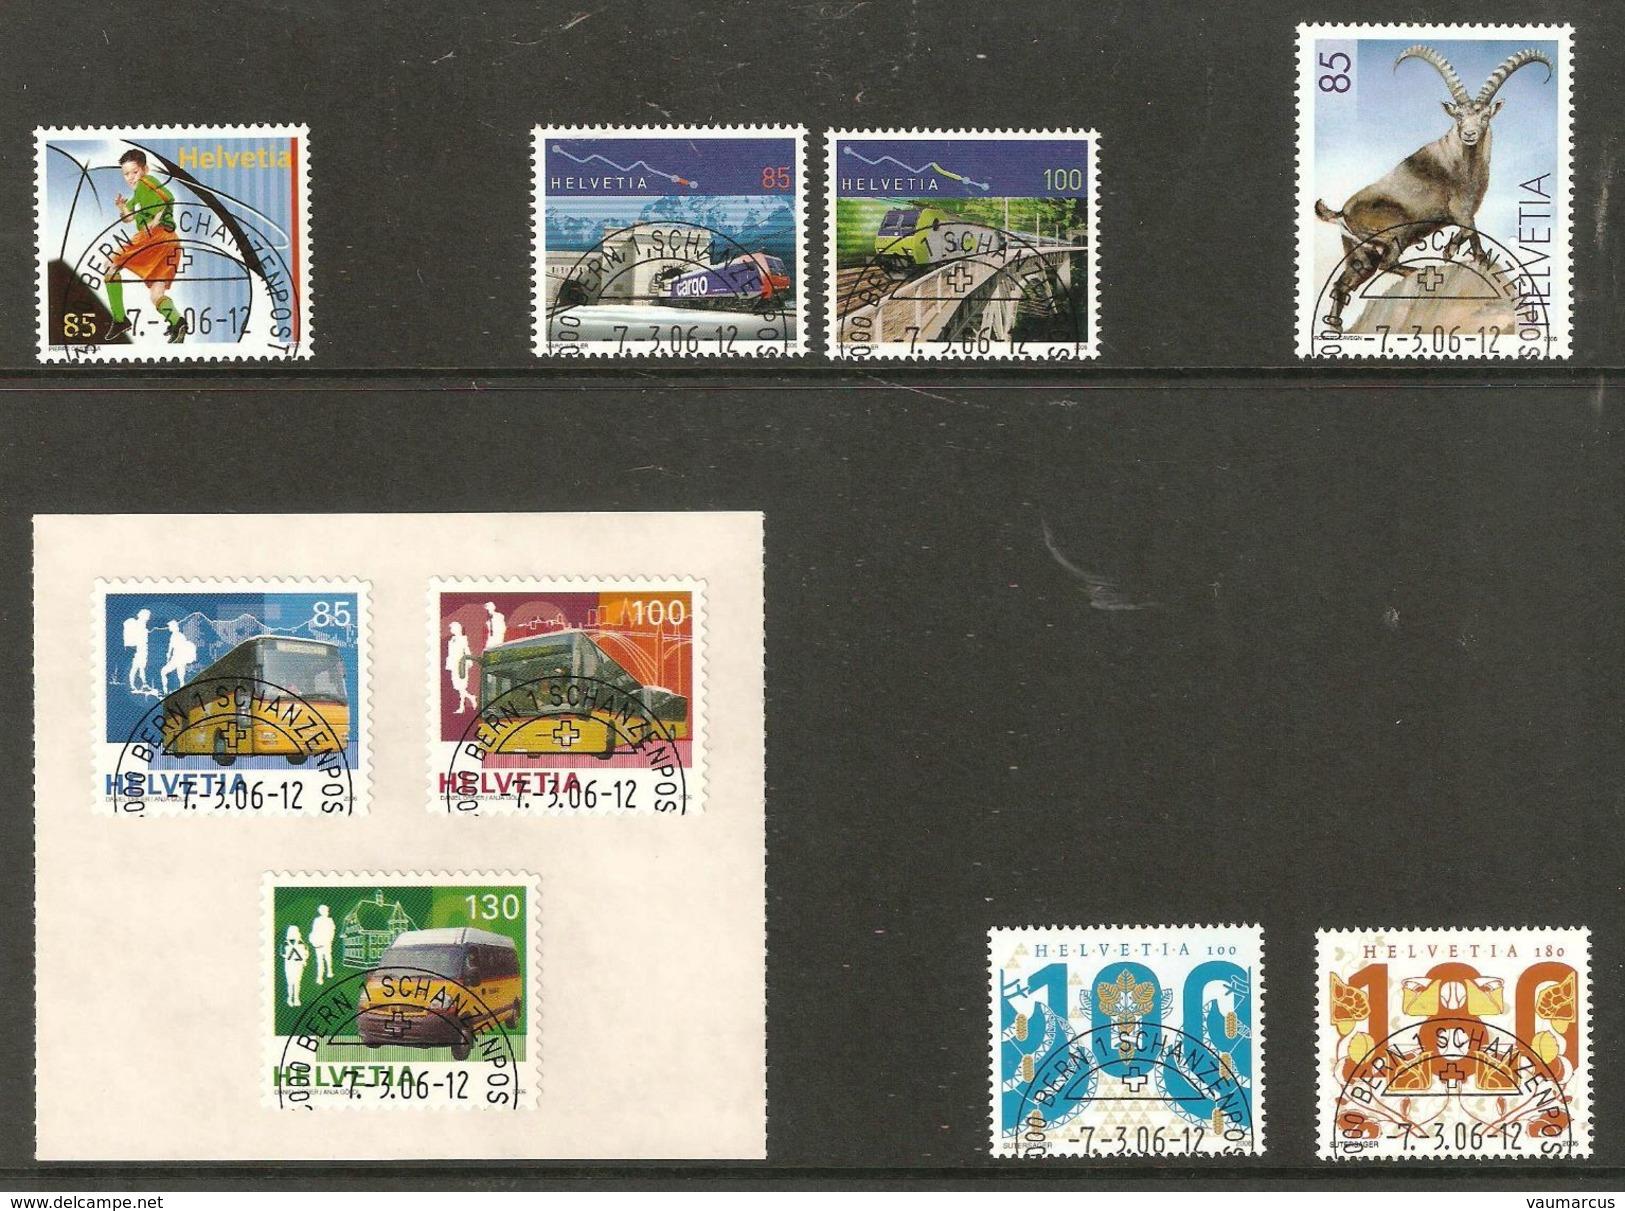 2006 Année Complète Obl. Demi-lune 1er Jour BERN 1 SCHANZENPOST SBK 164,- Voir 5 Scans - Used Stamps